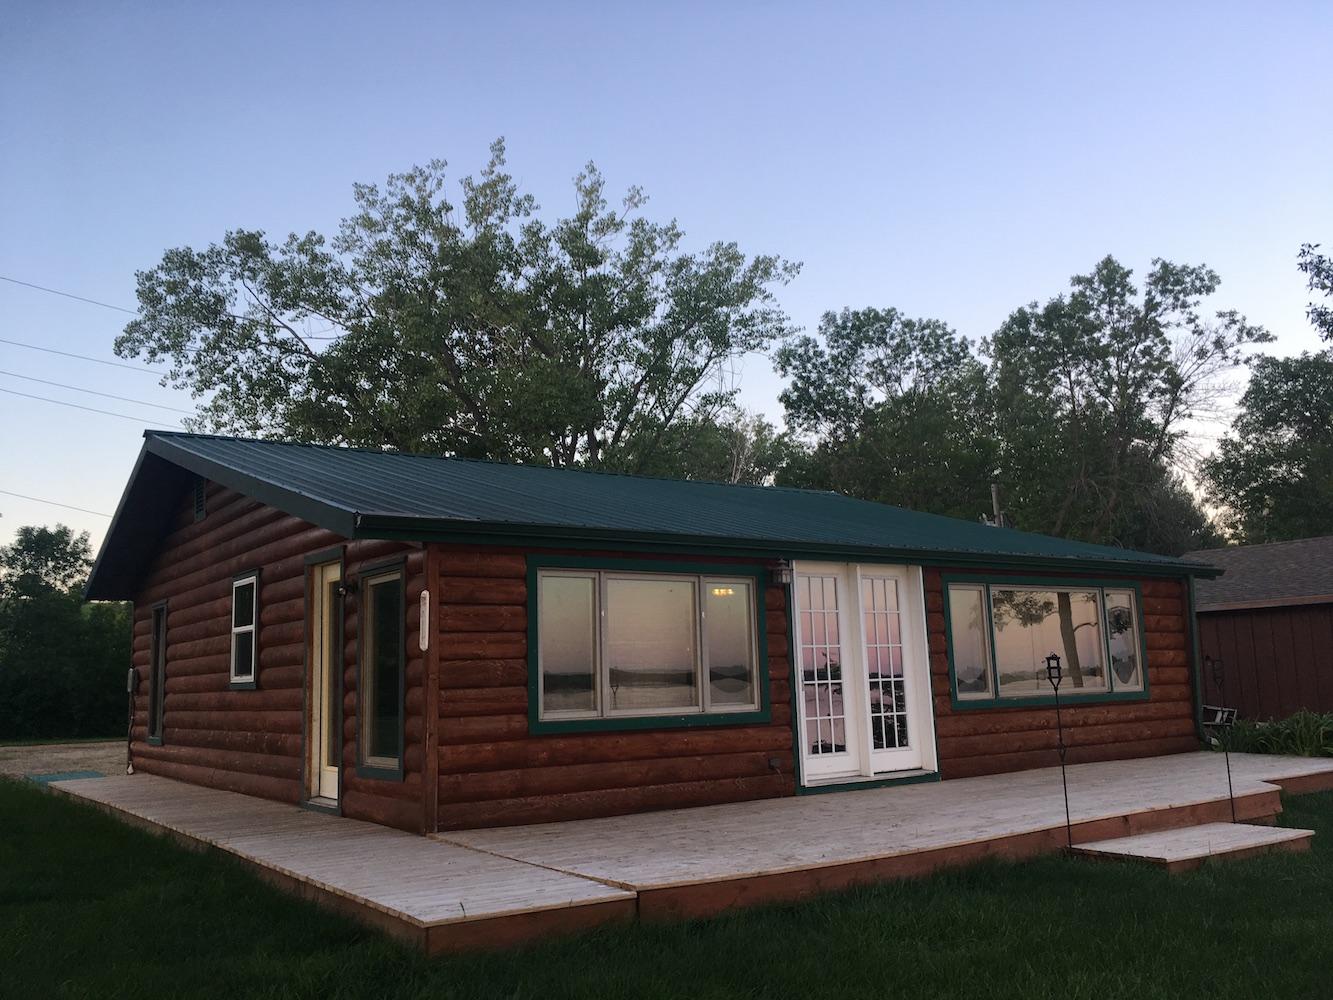 Sold Properties - 81385 Sherman Shoreline Road